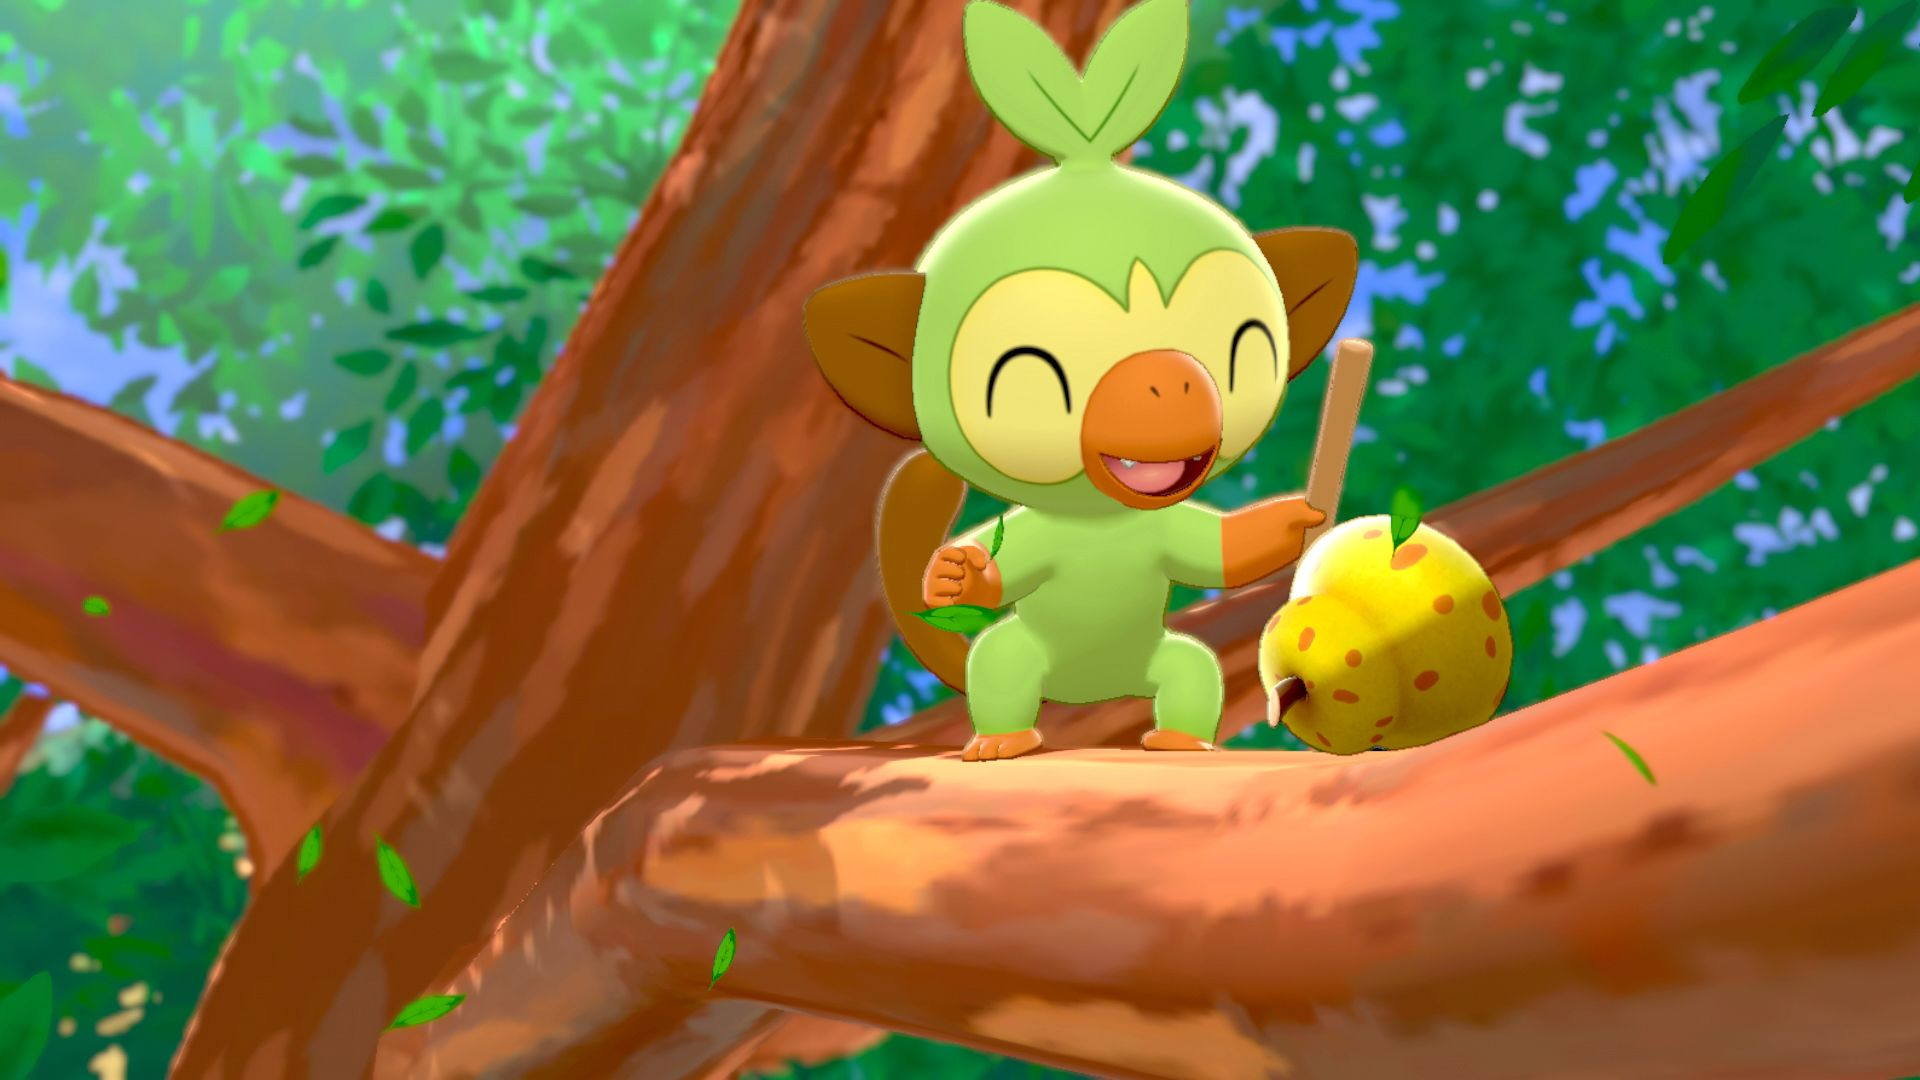 Undertale creator Toby Fox's Pokémon Sword and Shield song is based off of a Homestuck fan tune